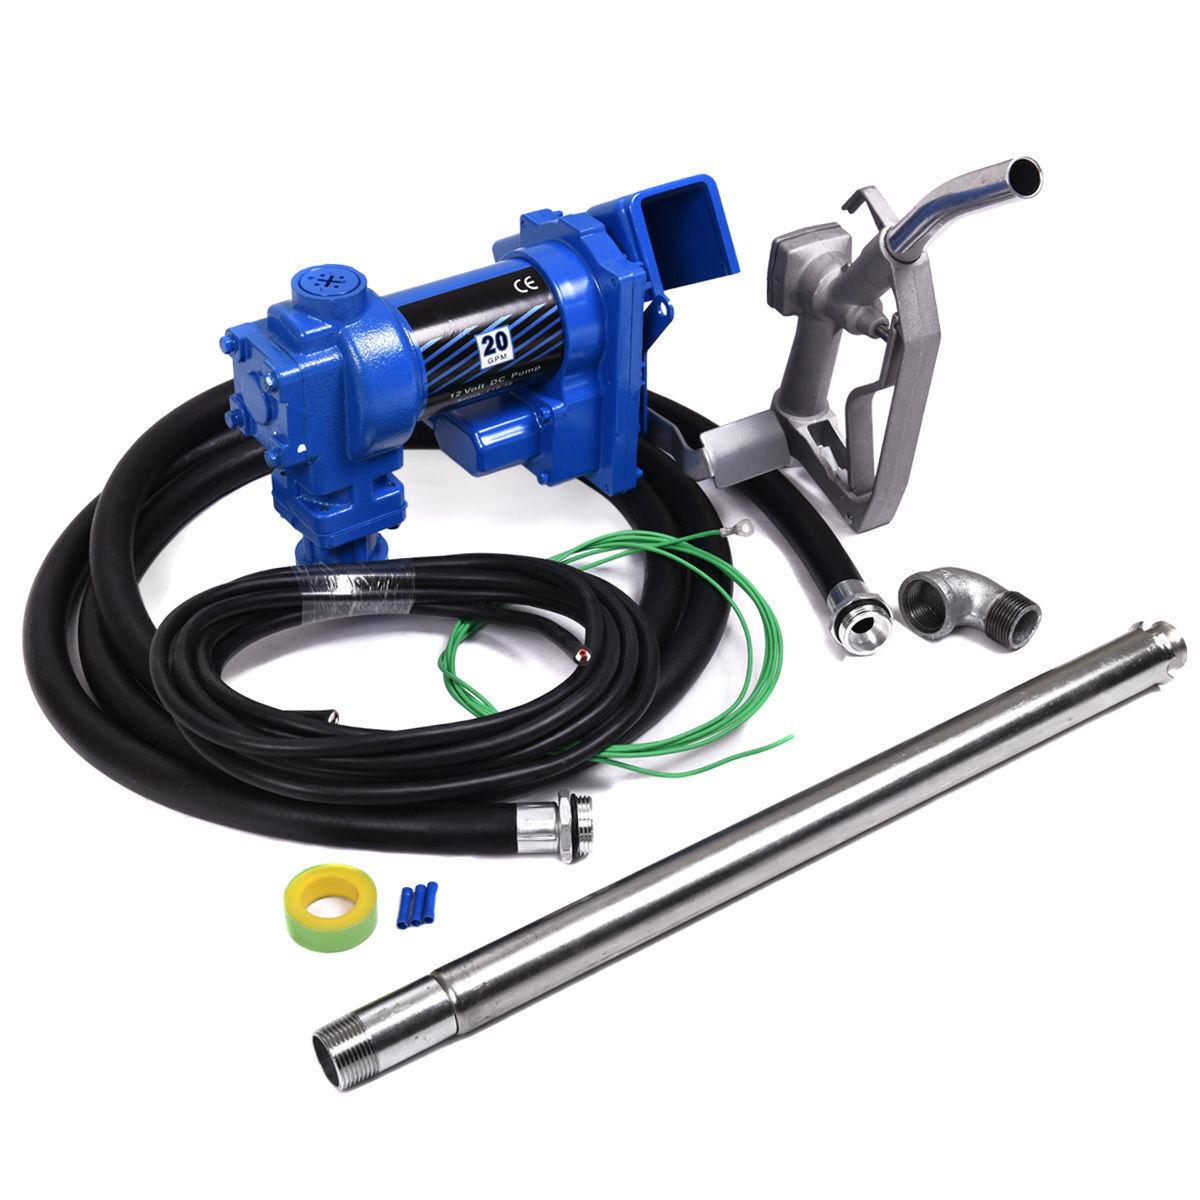 12V DC 20GPM Gasoline Fuel Transfer Pump Gas Diesel Kerosene w/ Nozzle Kit